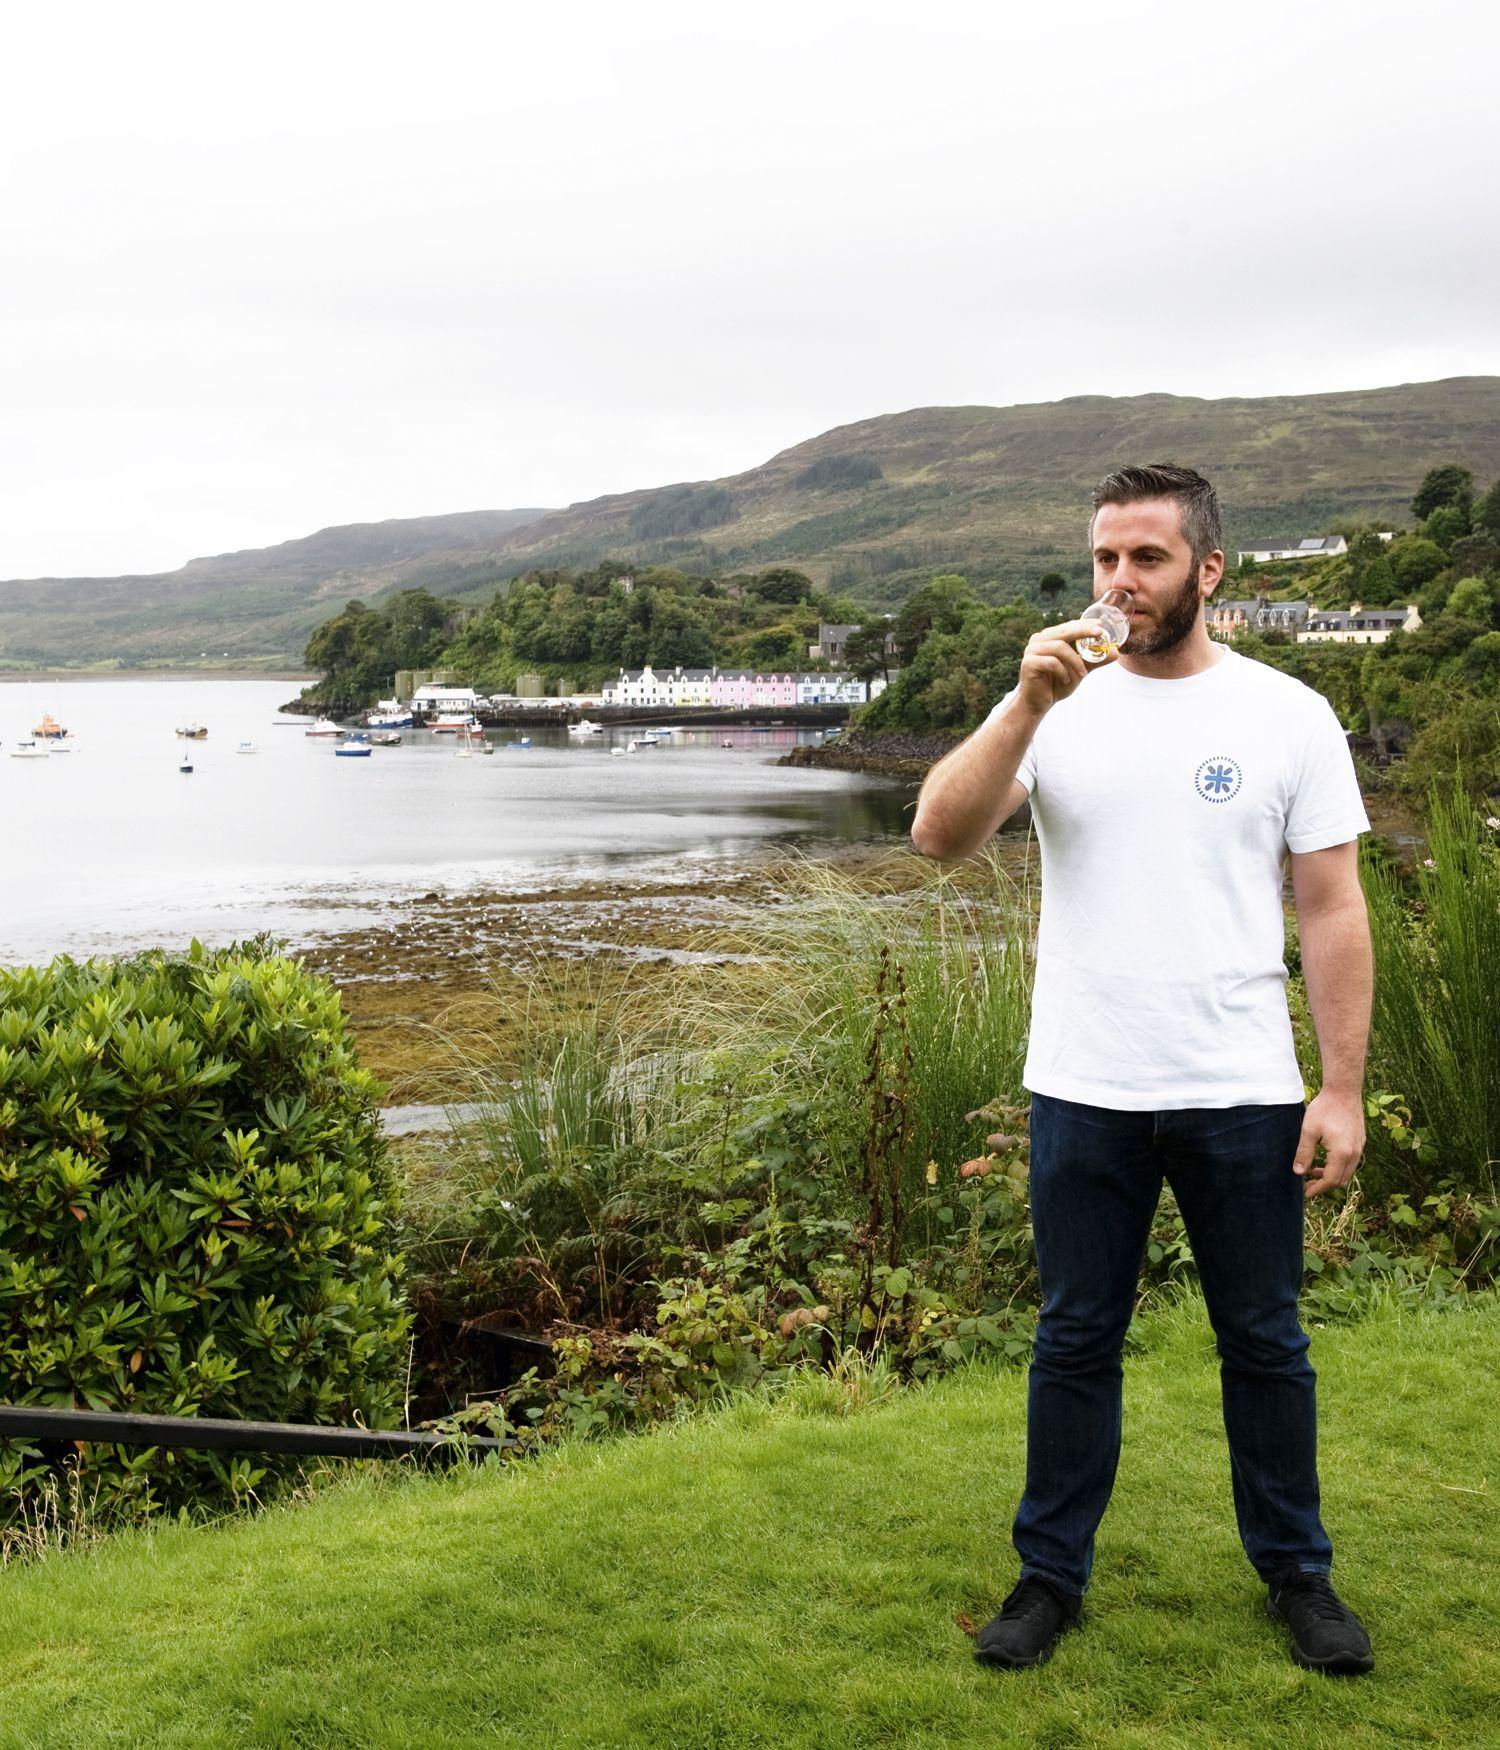 Exploring Scotland's Centuries-Old Distilleries With Elliot Faber